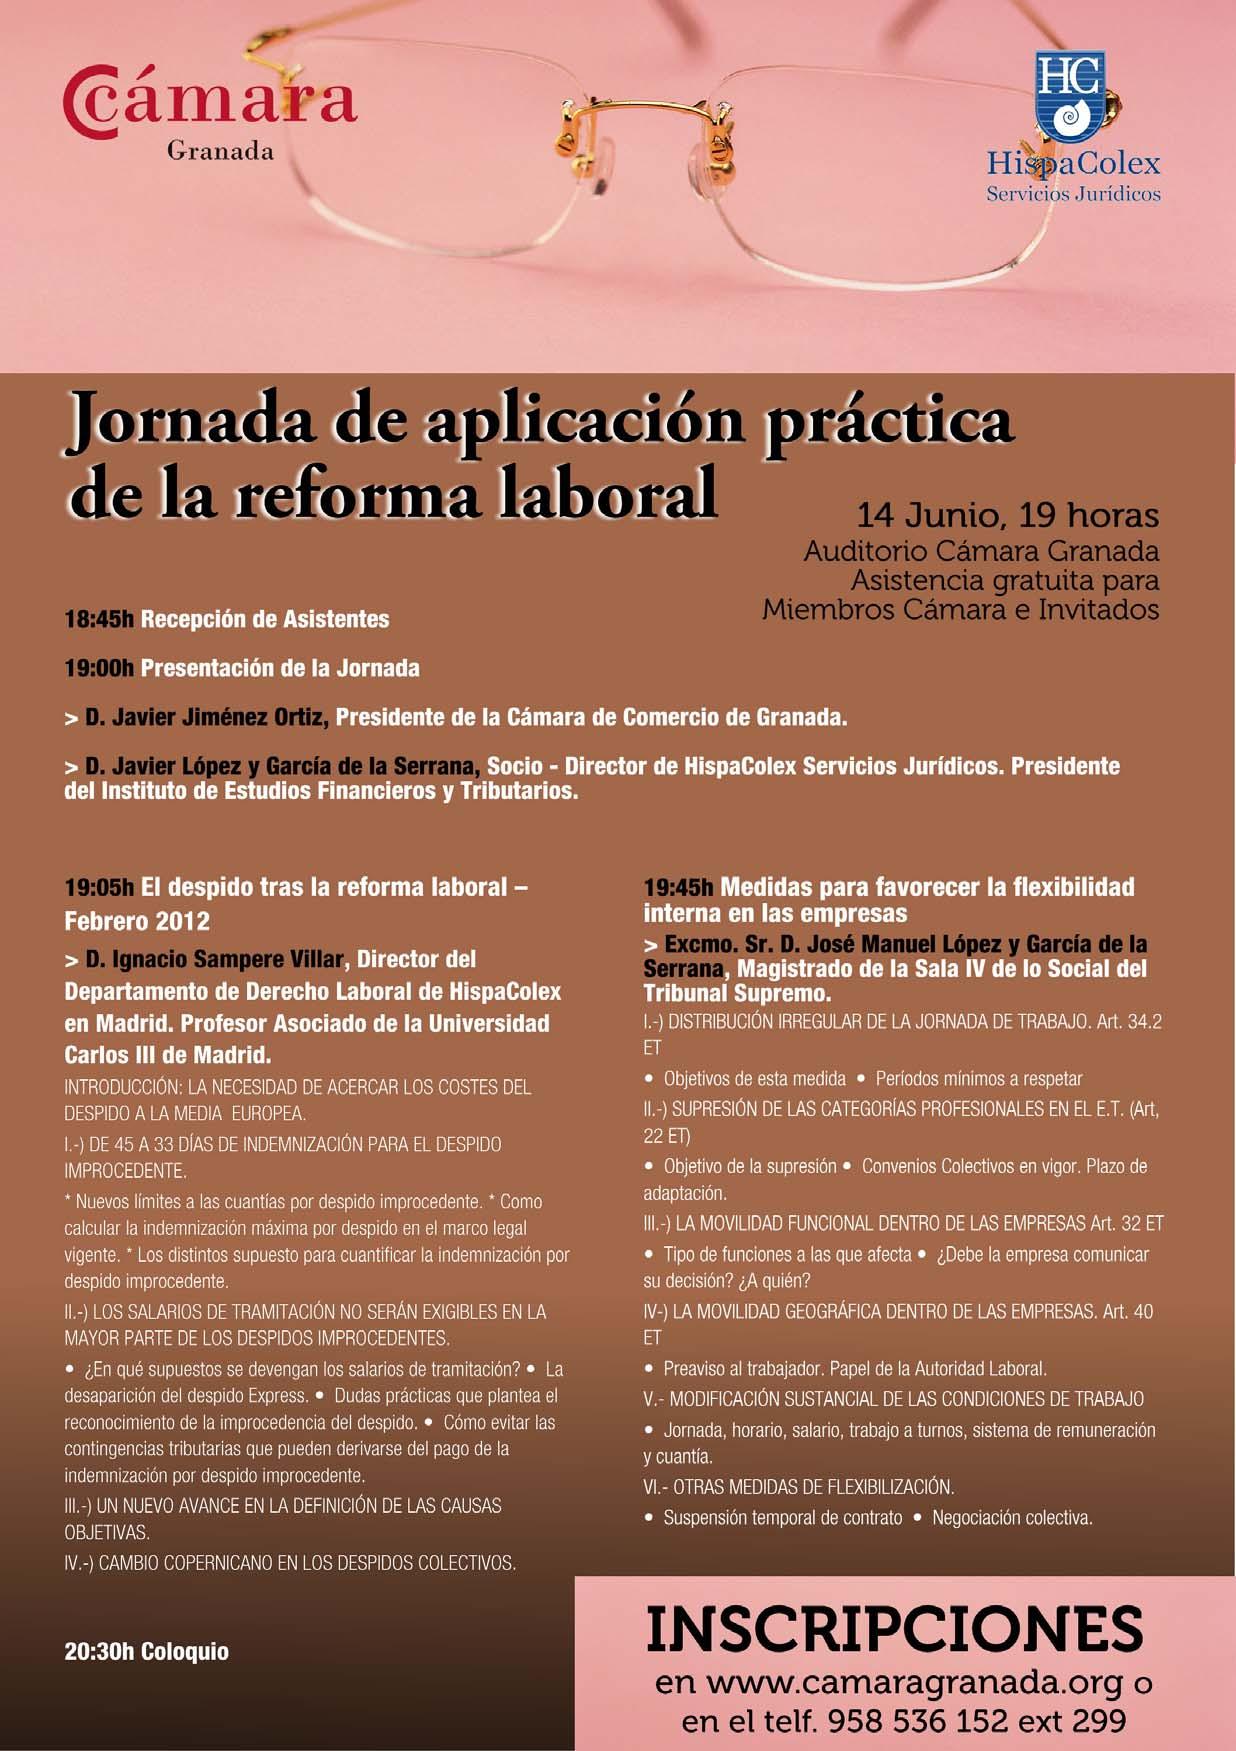 pdfjornada_reforma_laboral_camara_e_hispacolex